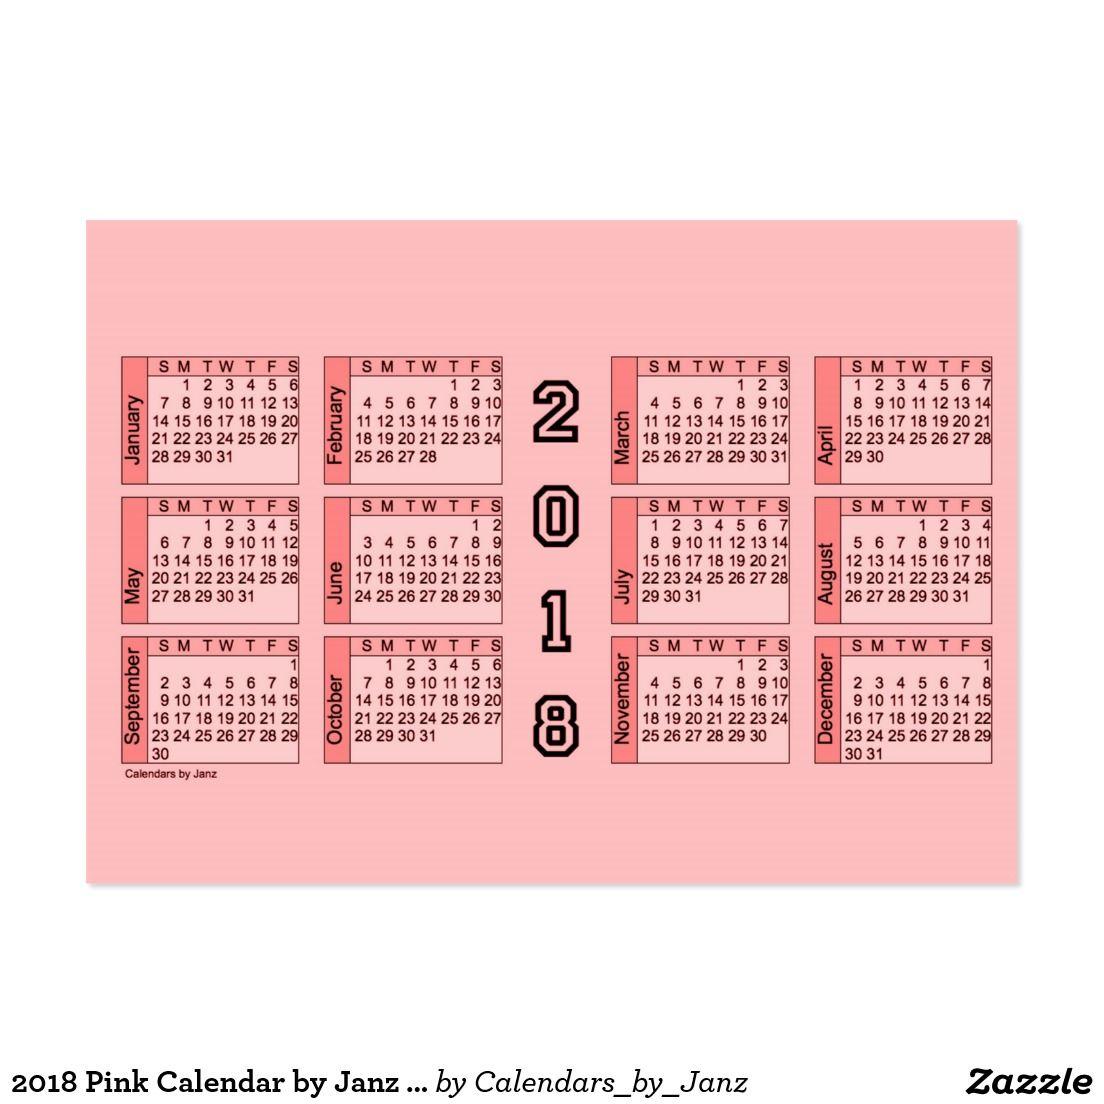 2018 Pink Calendar by Janz Chubby Business Card | Calendars by ...